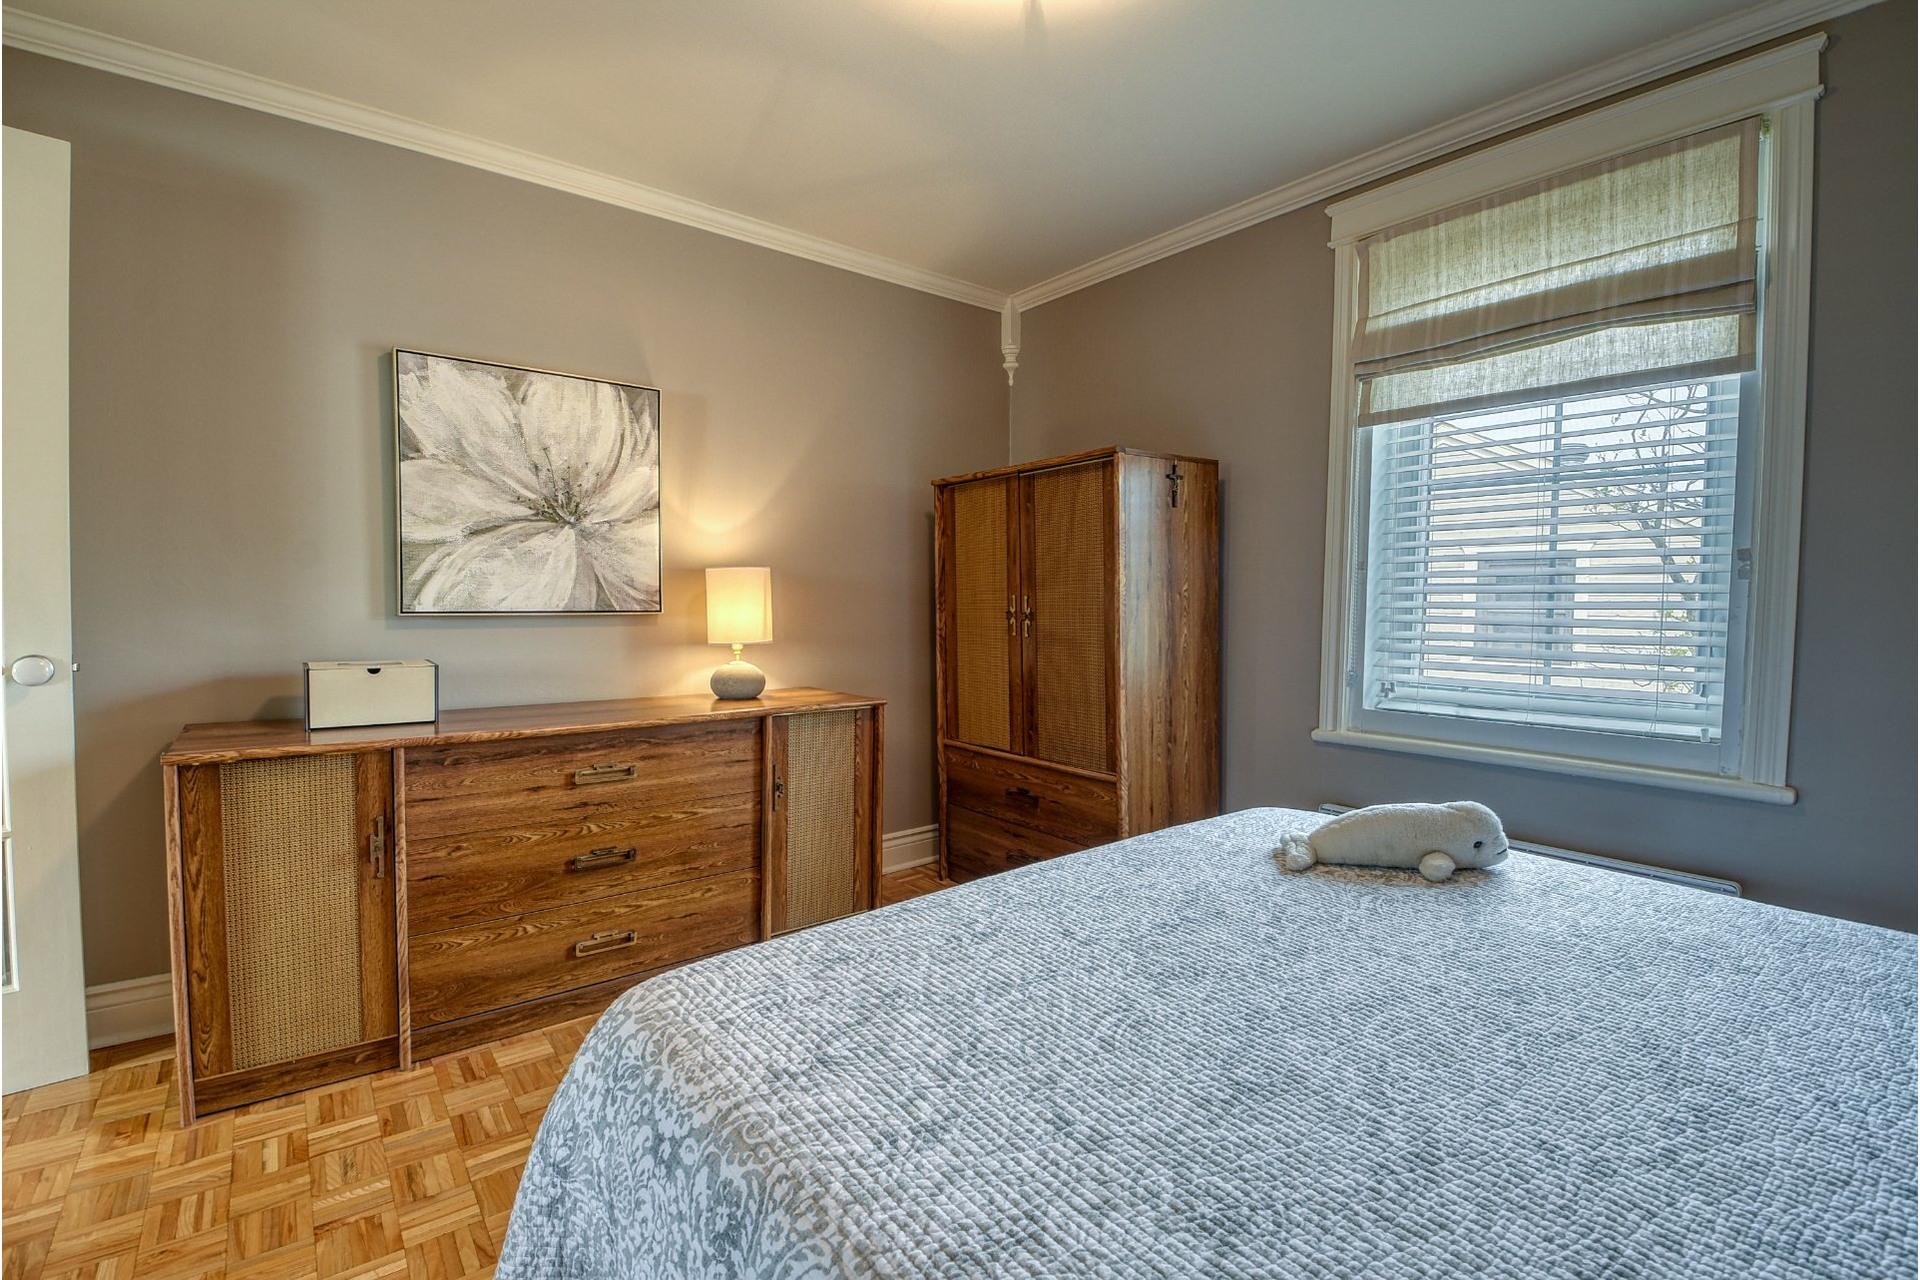 image 15 - Triplex For sale Terrebonne Terrebonne  - 9 rooms